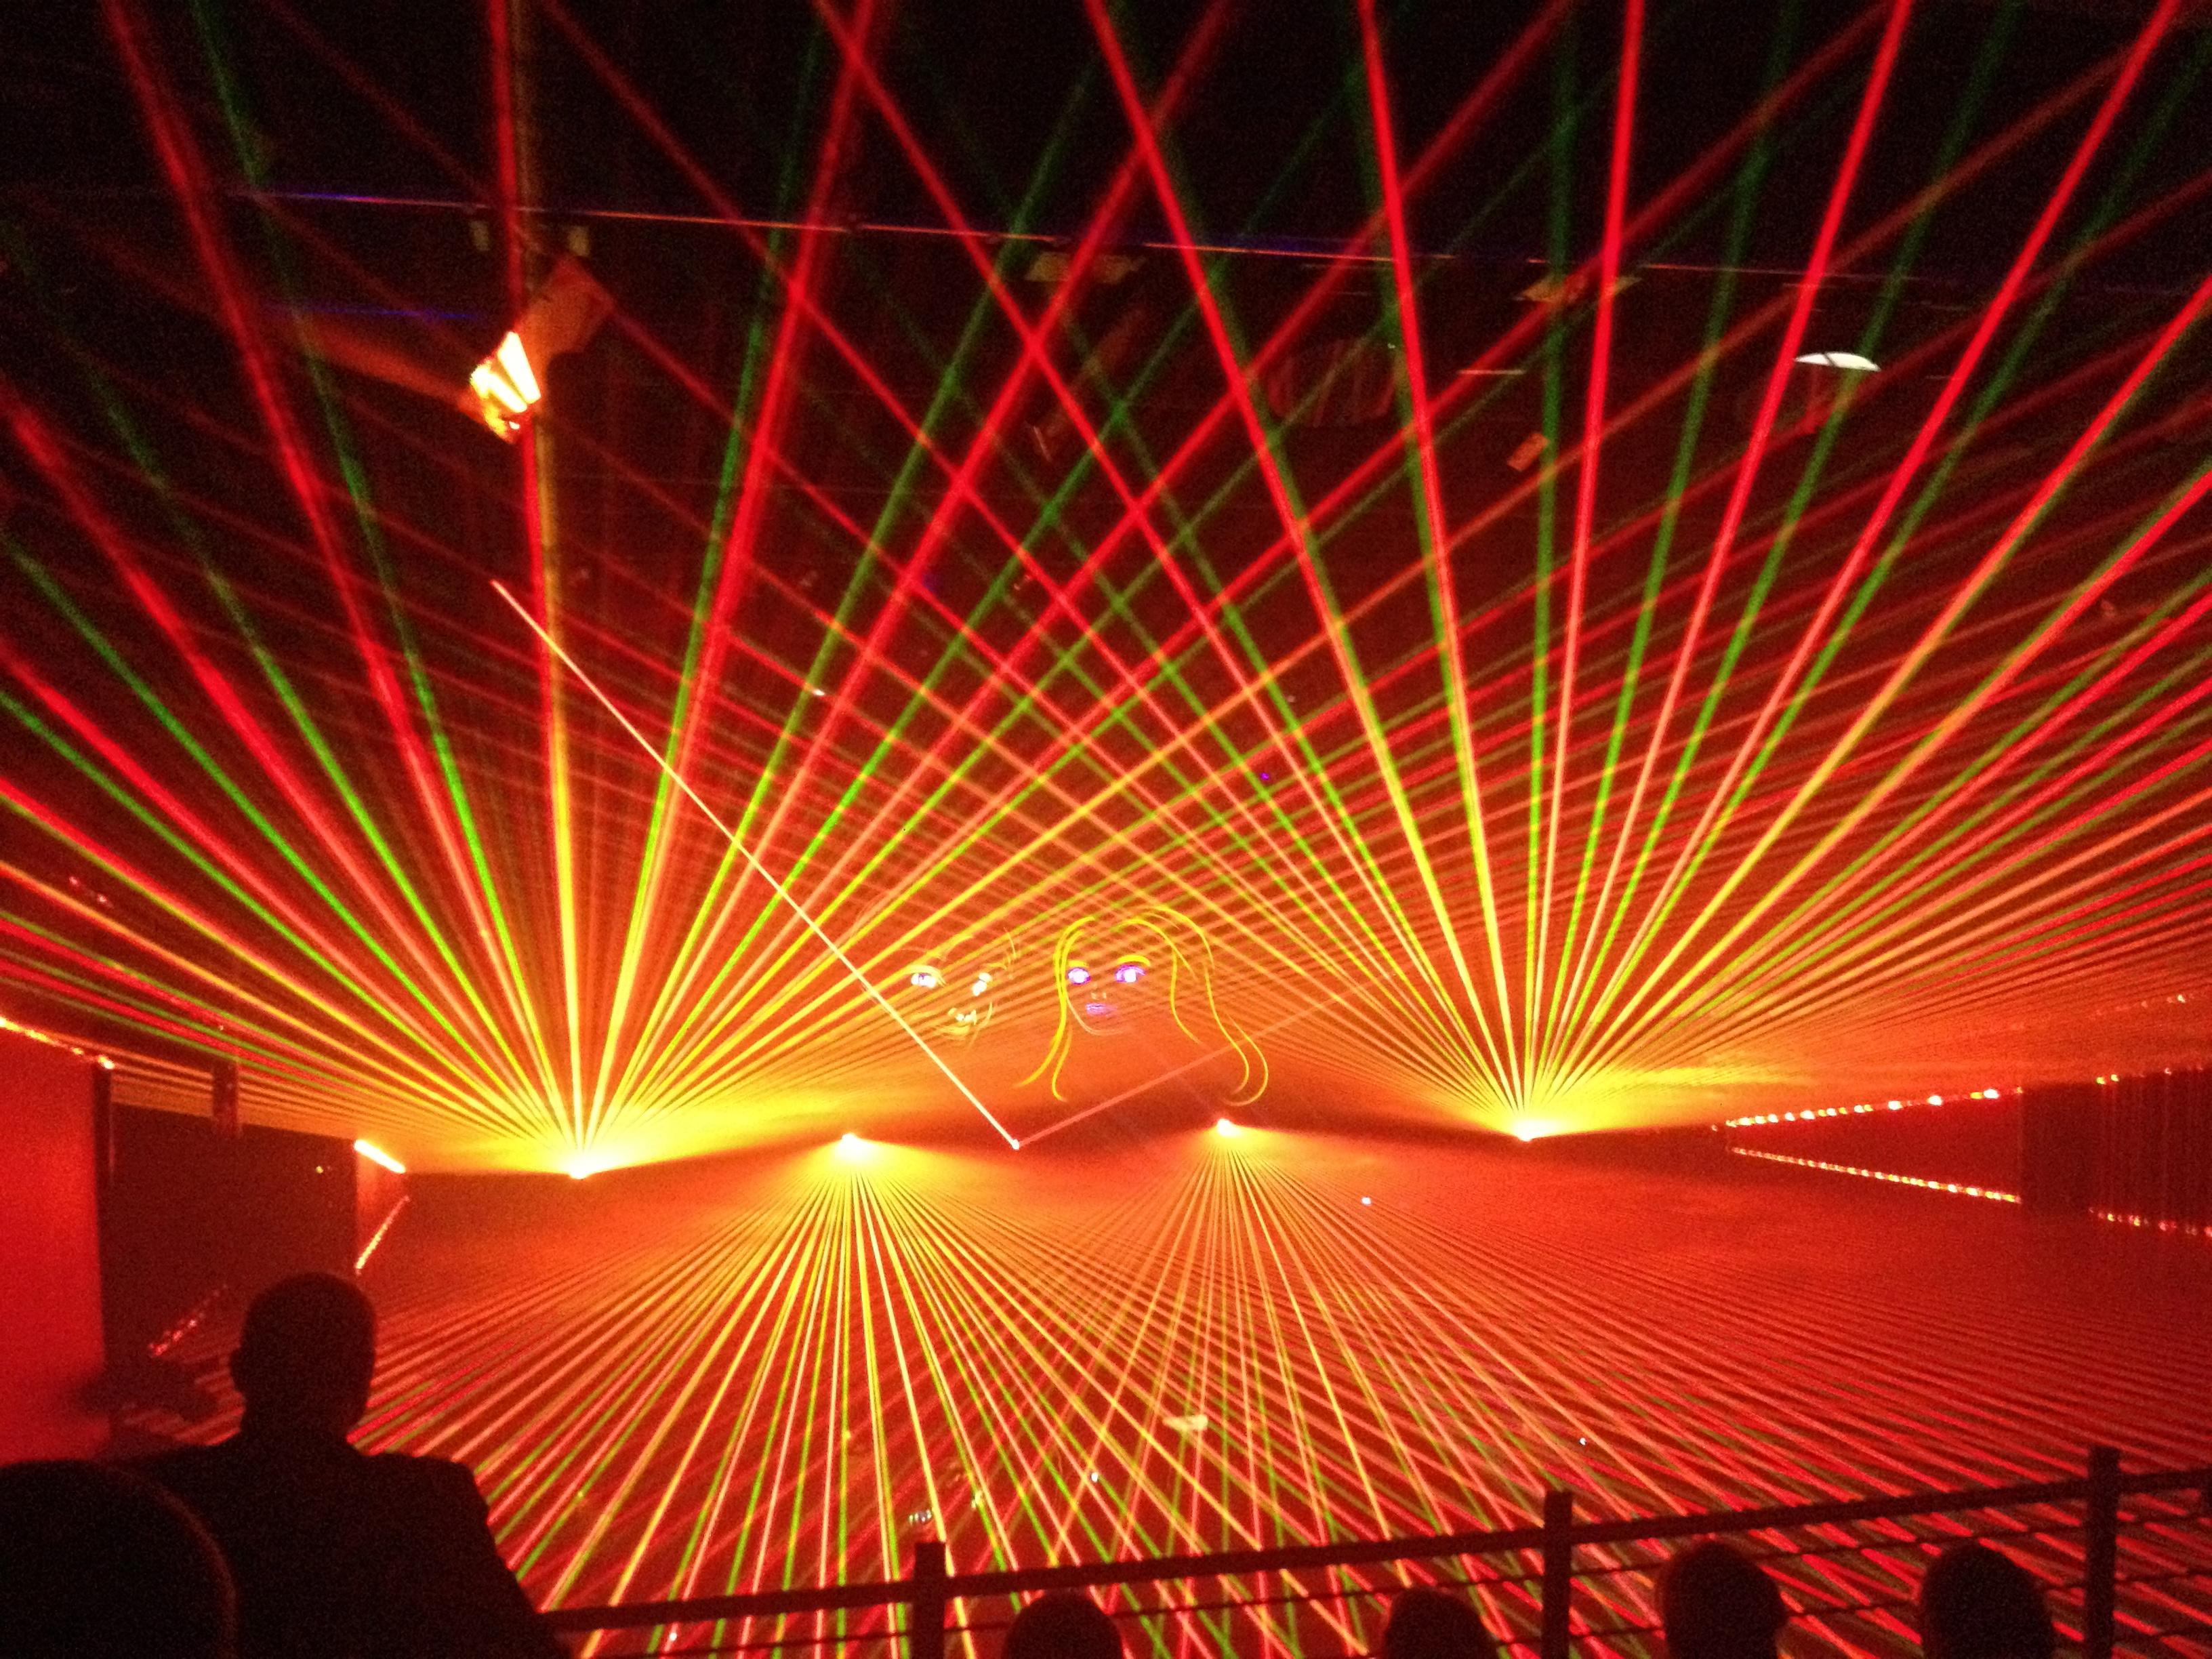 Tweaked Laser Pointer Can Bring Self-Driving Car to a Halt